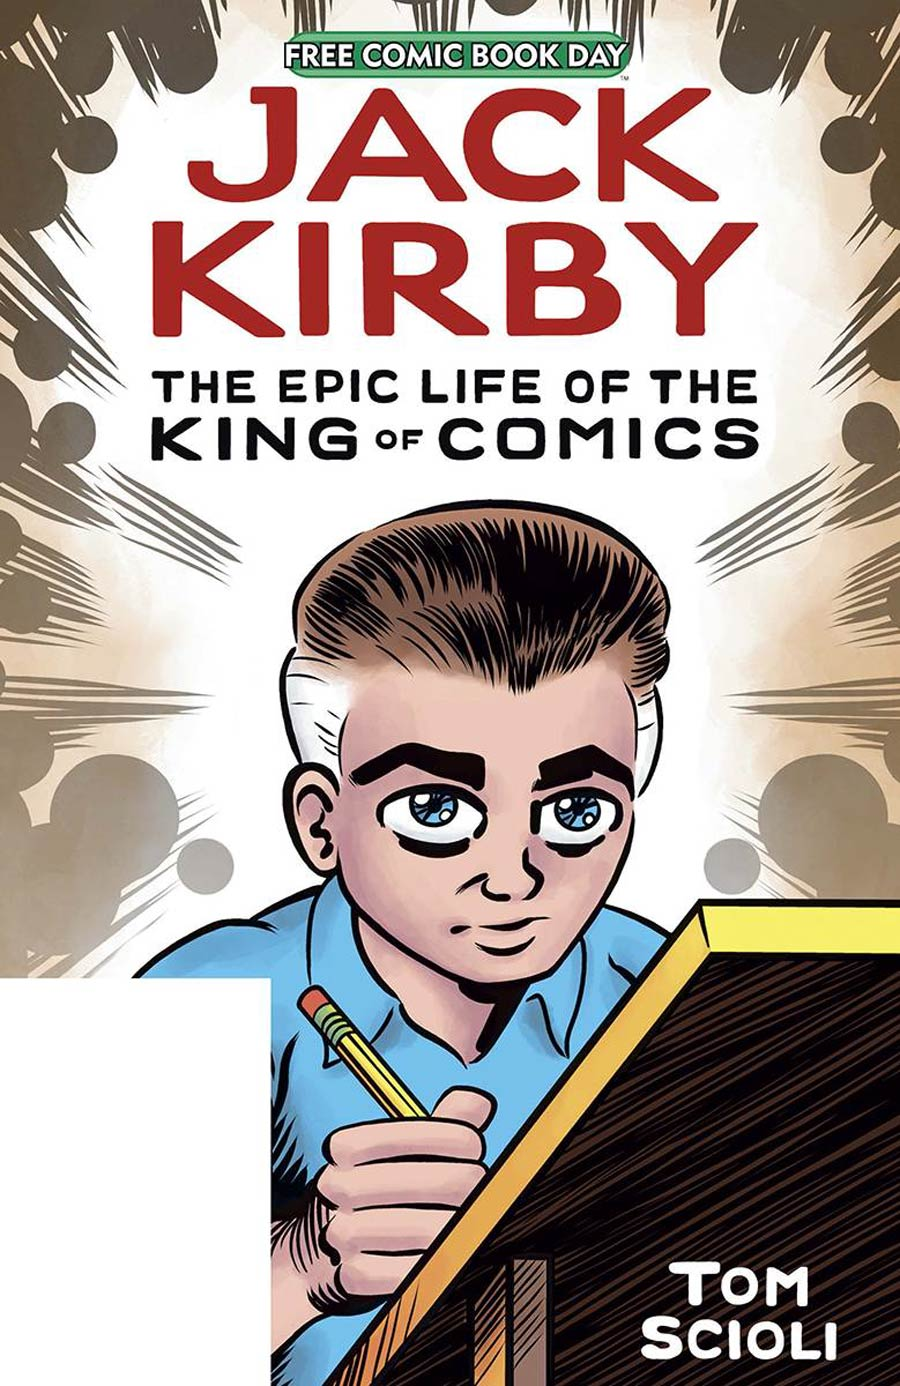 Jack Kirby The Epic Life Of The King Of Comics FCBD 2020